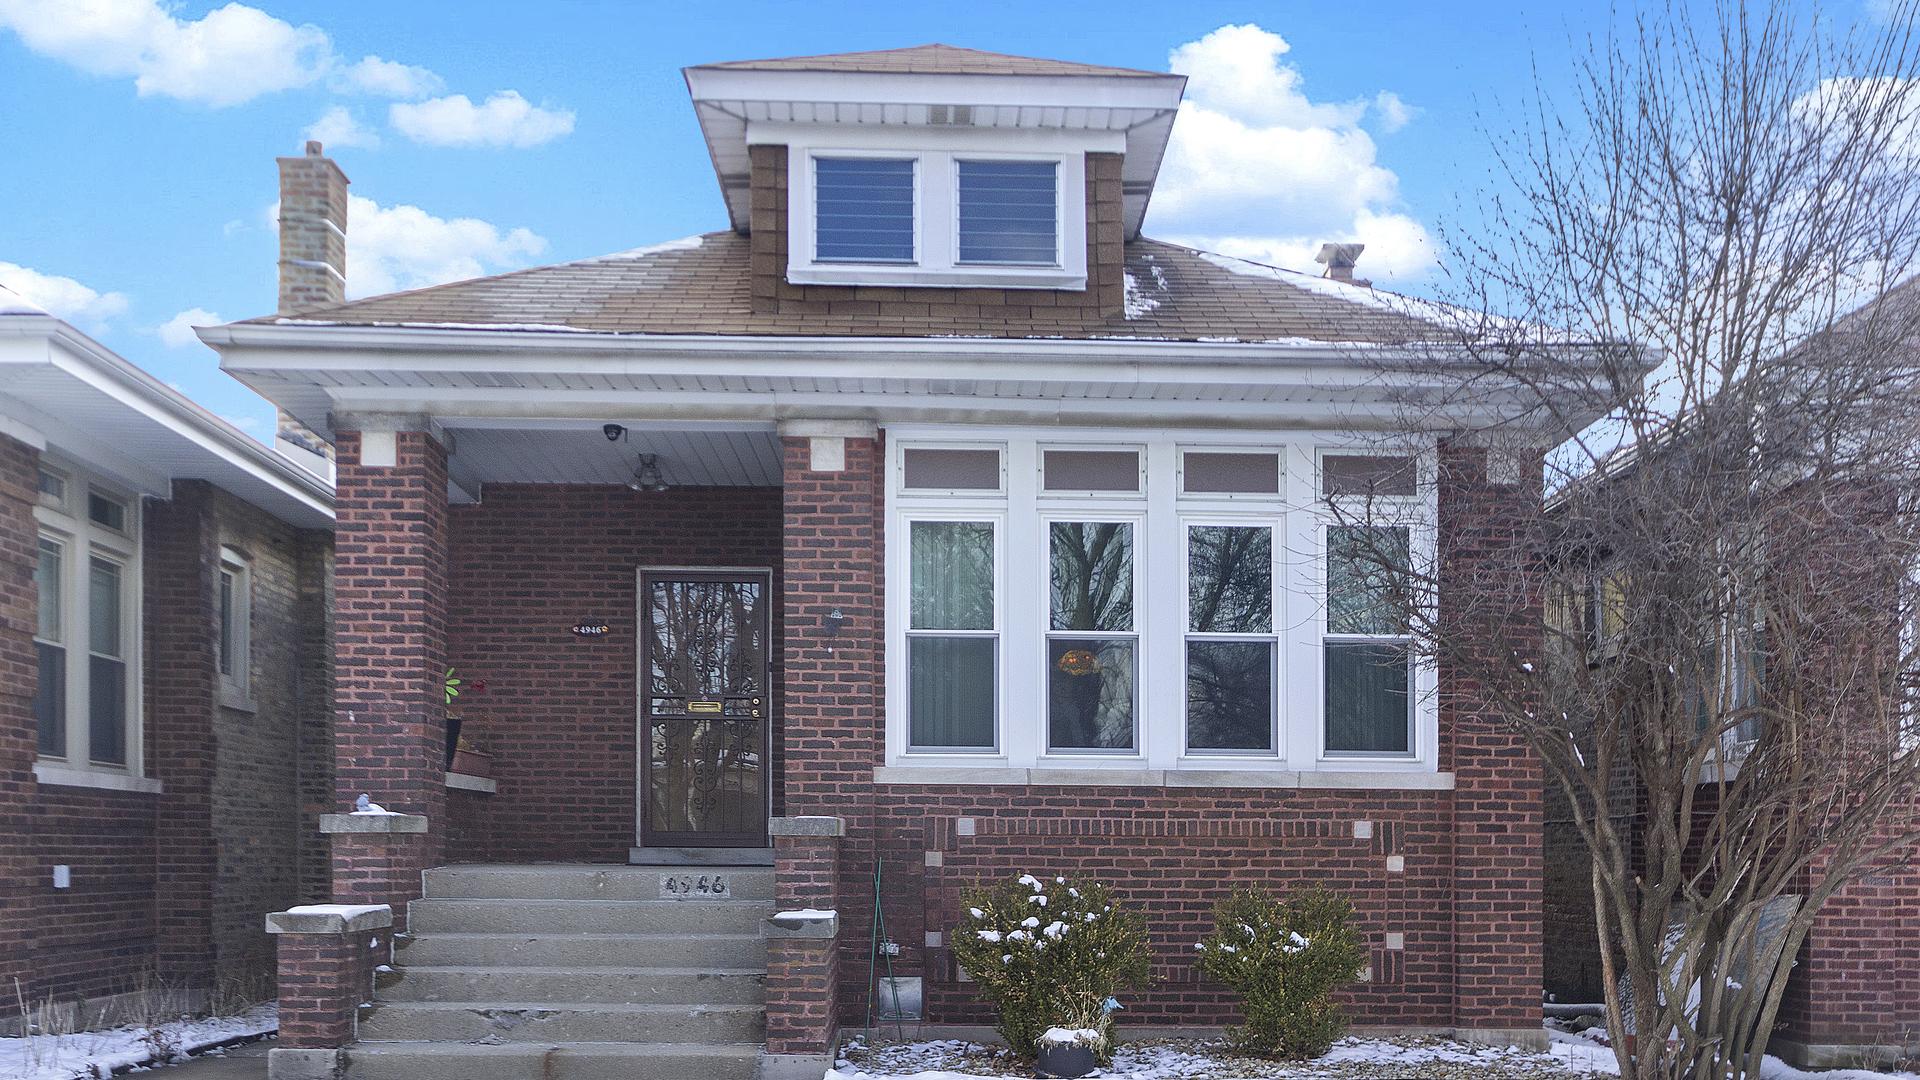 4946 N Keeler Avenue, Chicago IL 60630